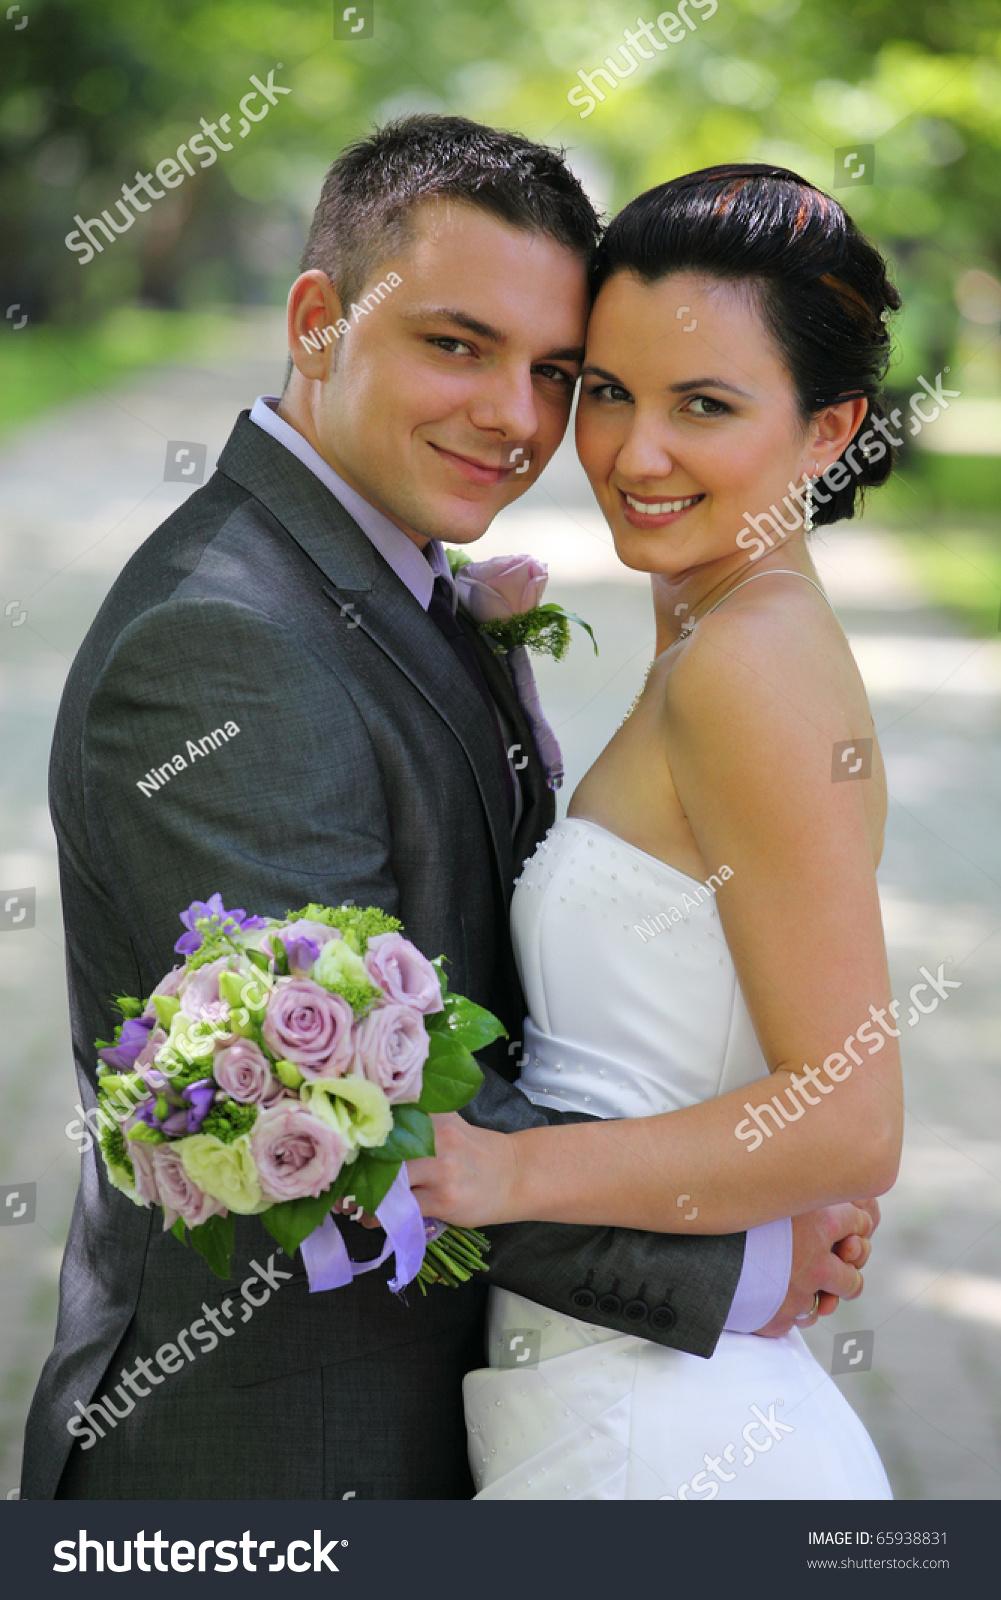 Online Image Amp Photo Editor